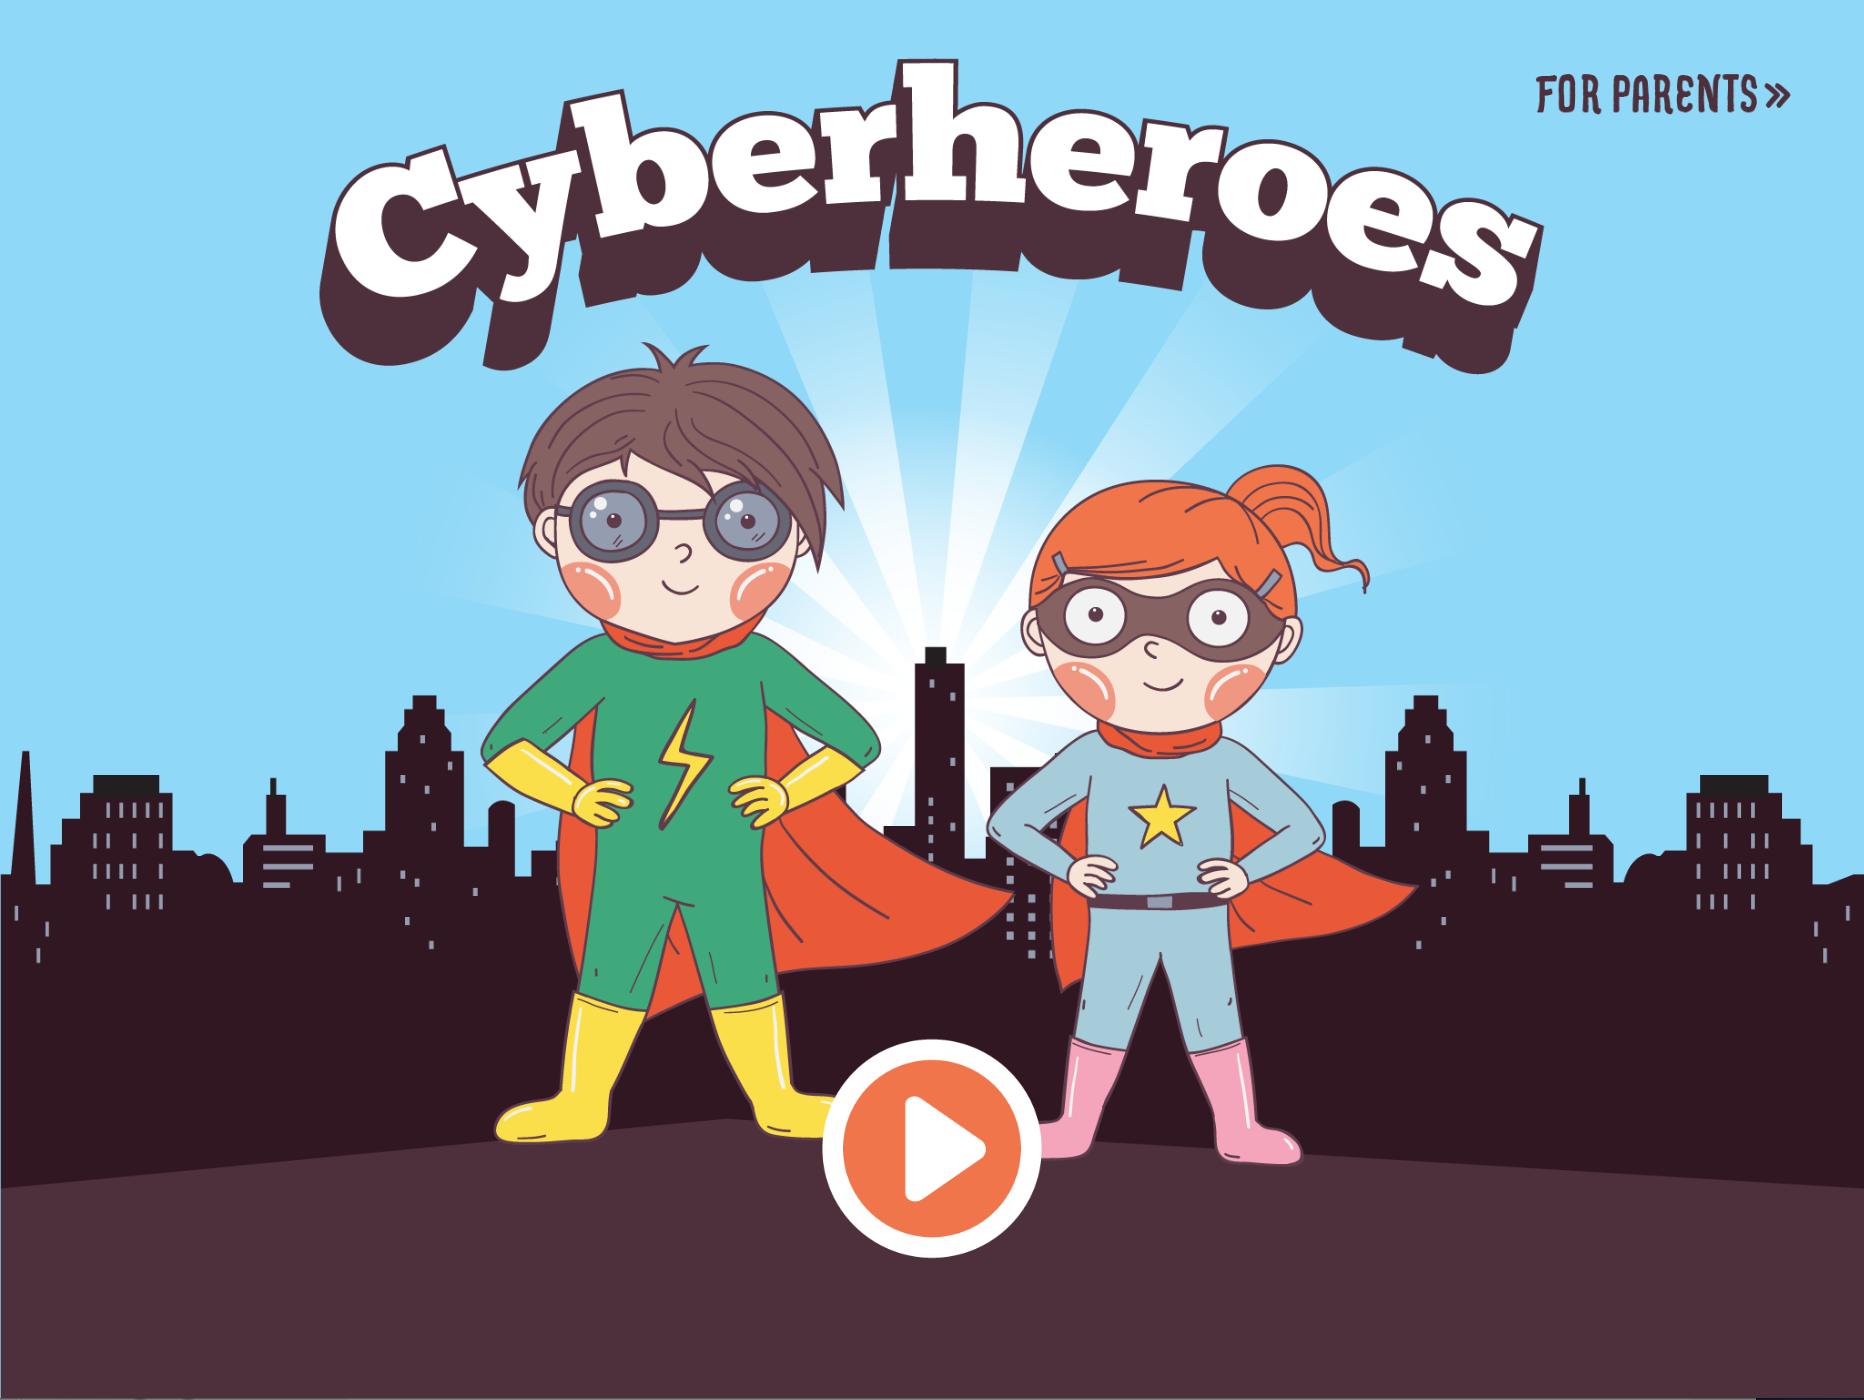 Cyberheroes screenshot